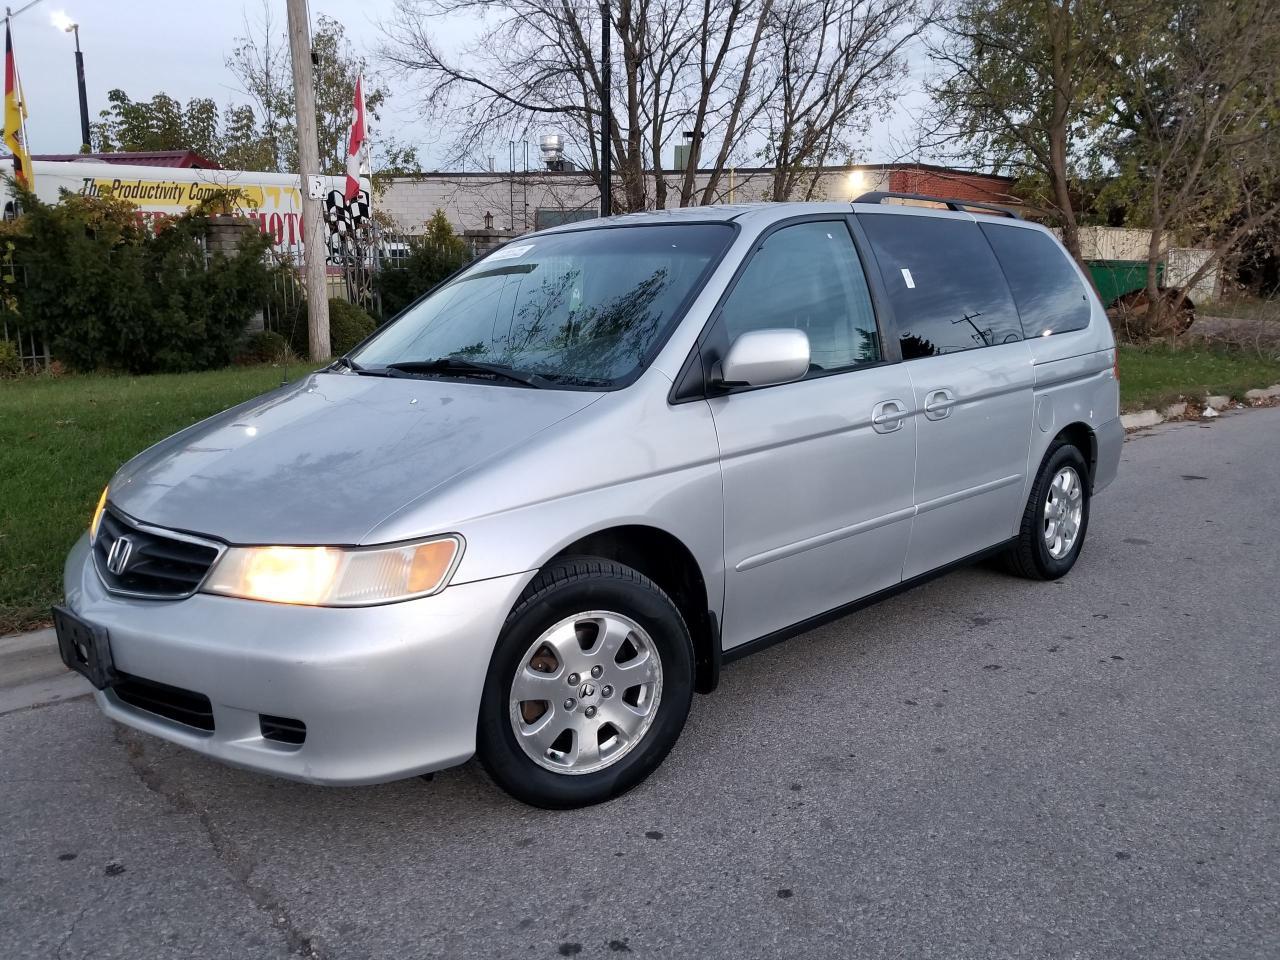 Photo of Silver 2004 Honda Odyssey